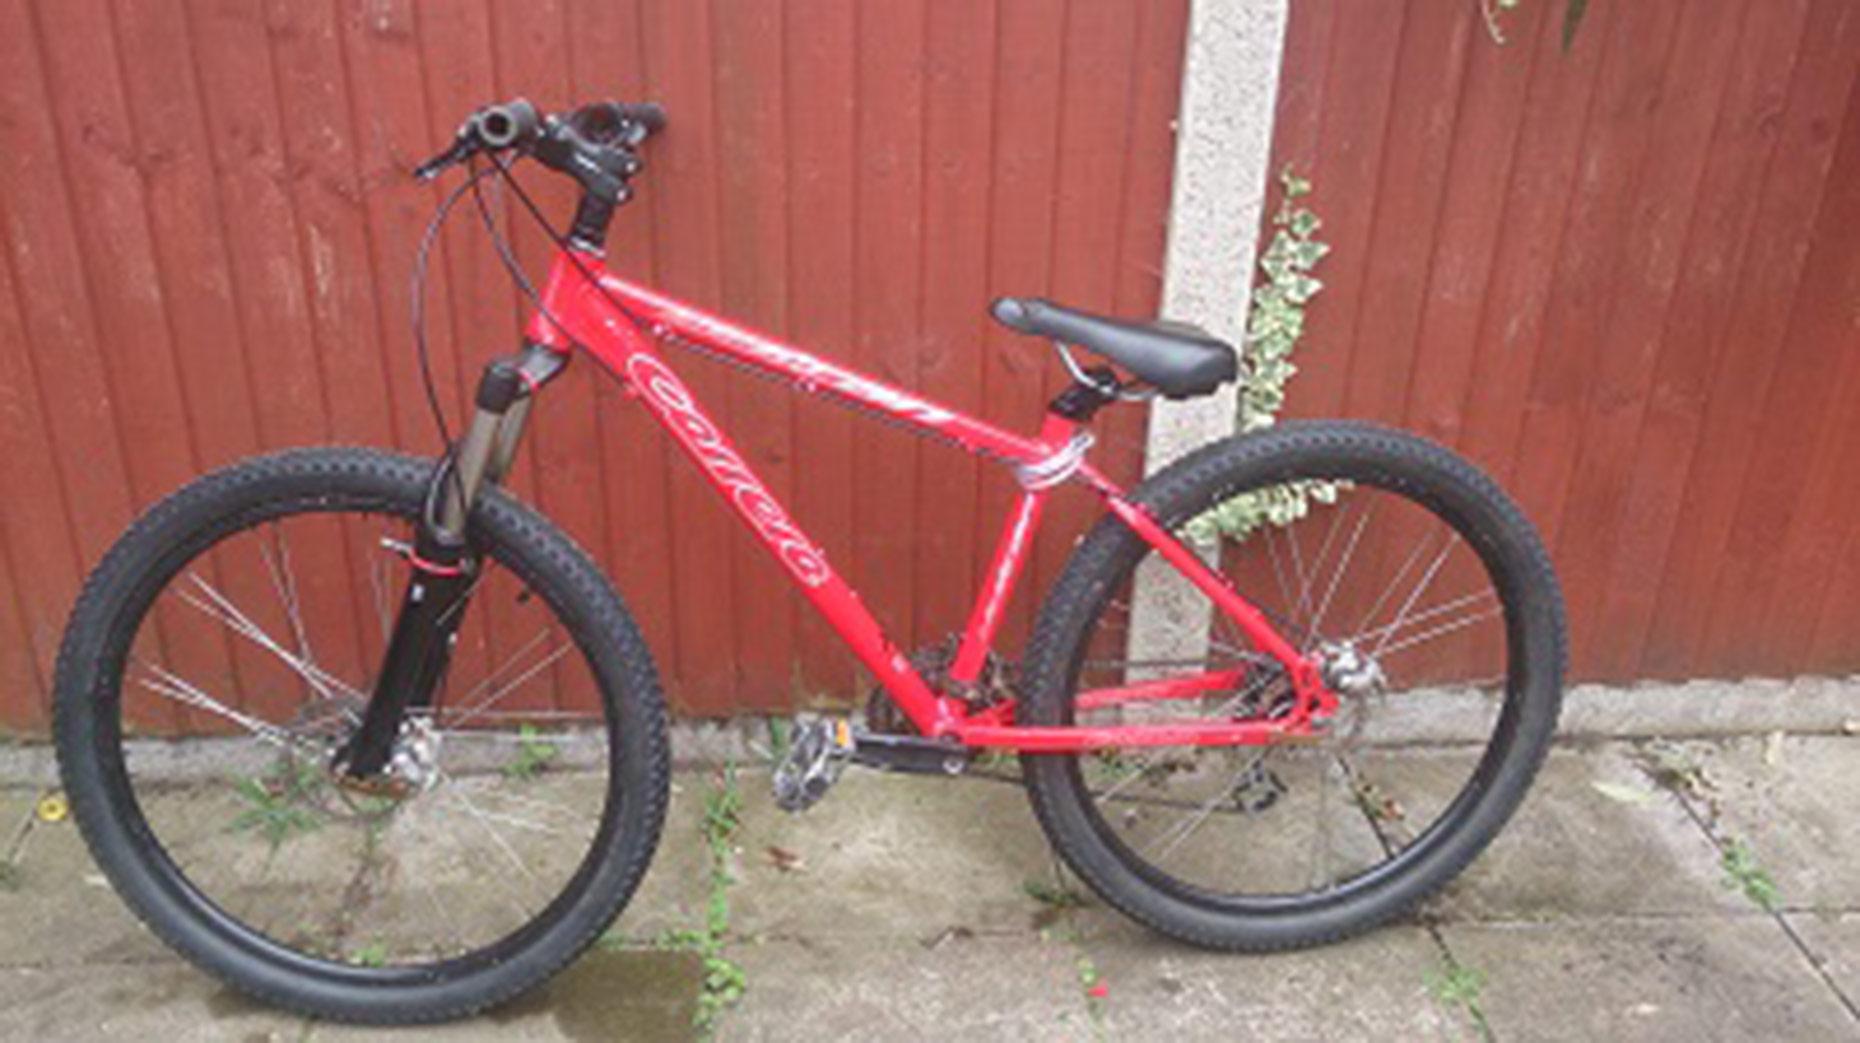 Mountain bike stolen from outside Lincoln Primark store